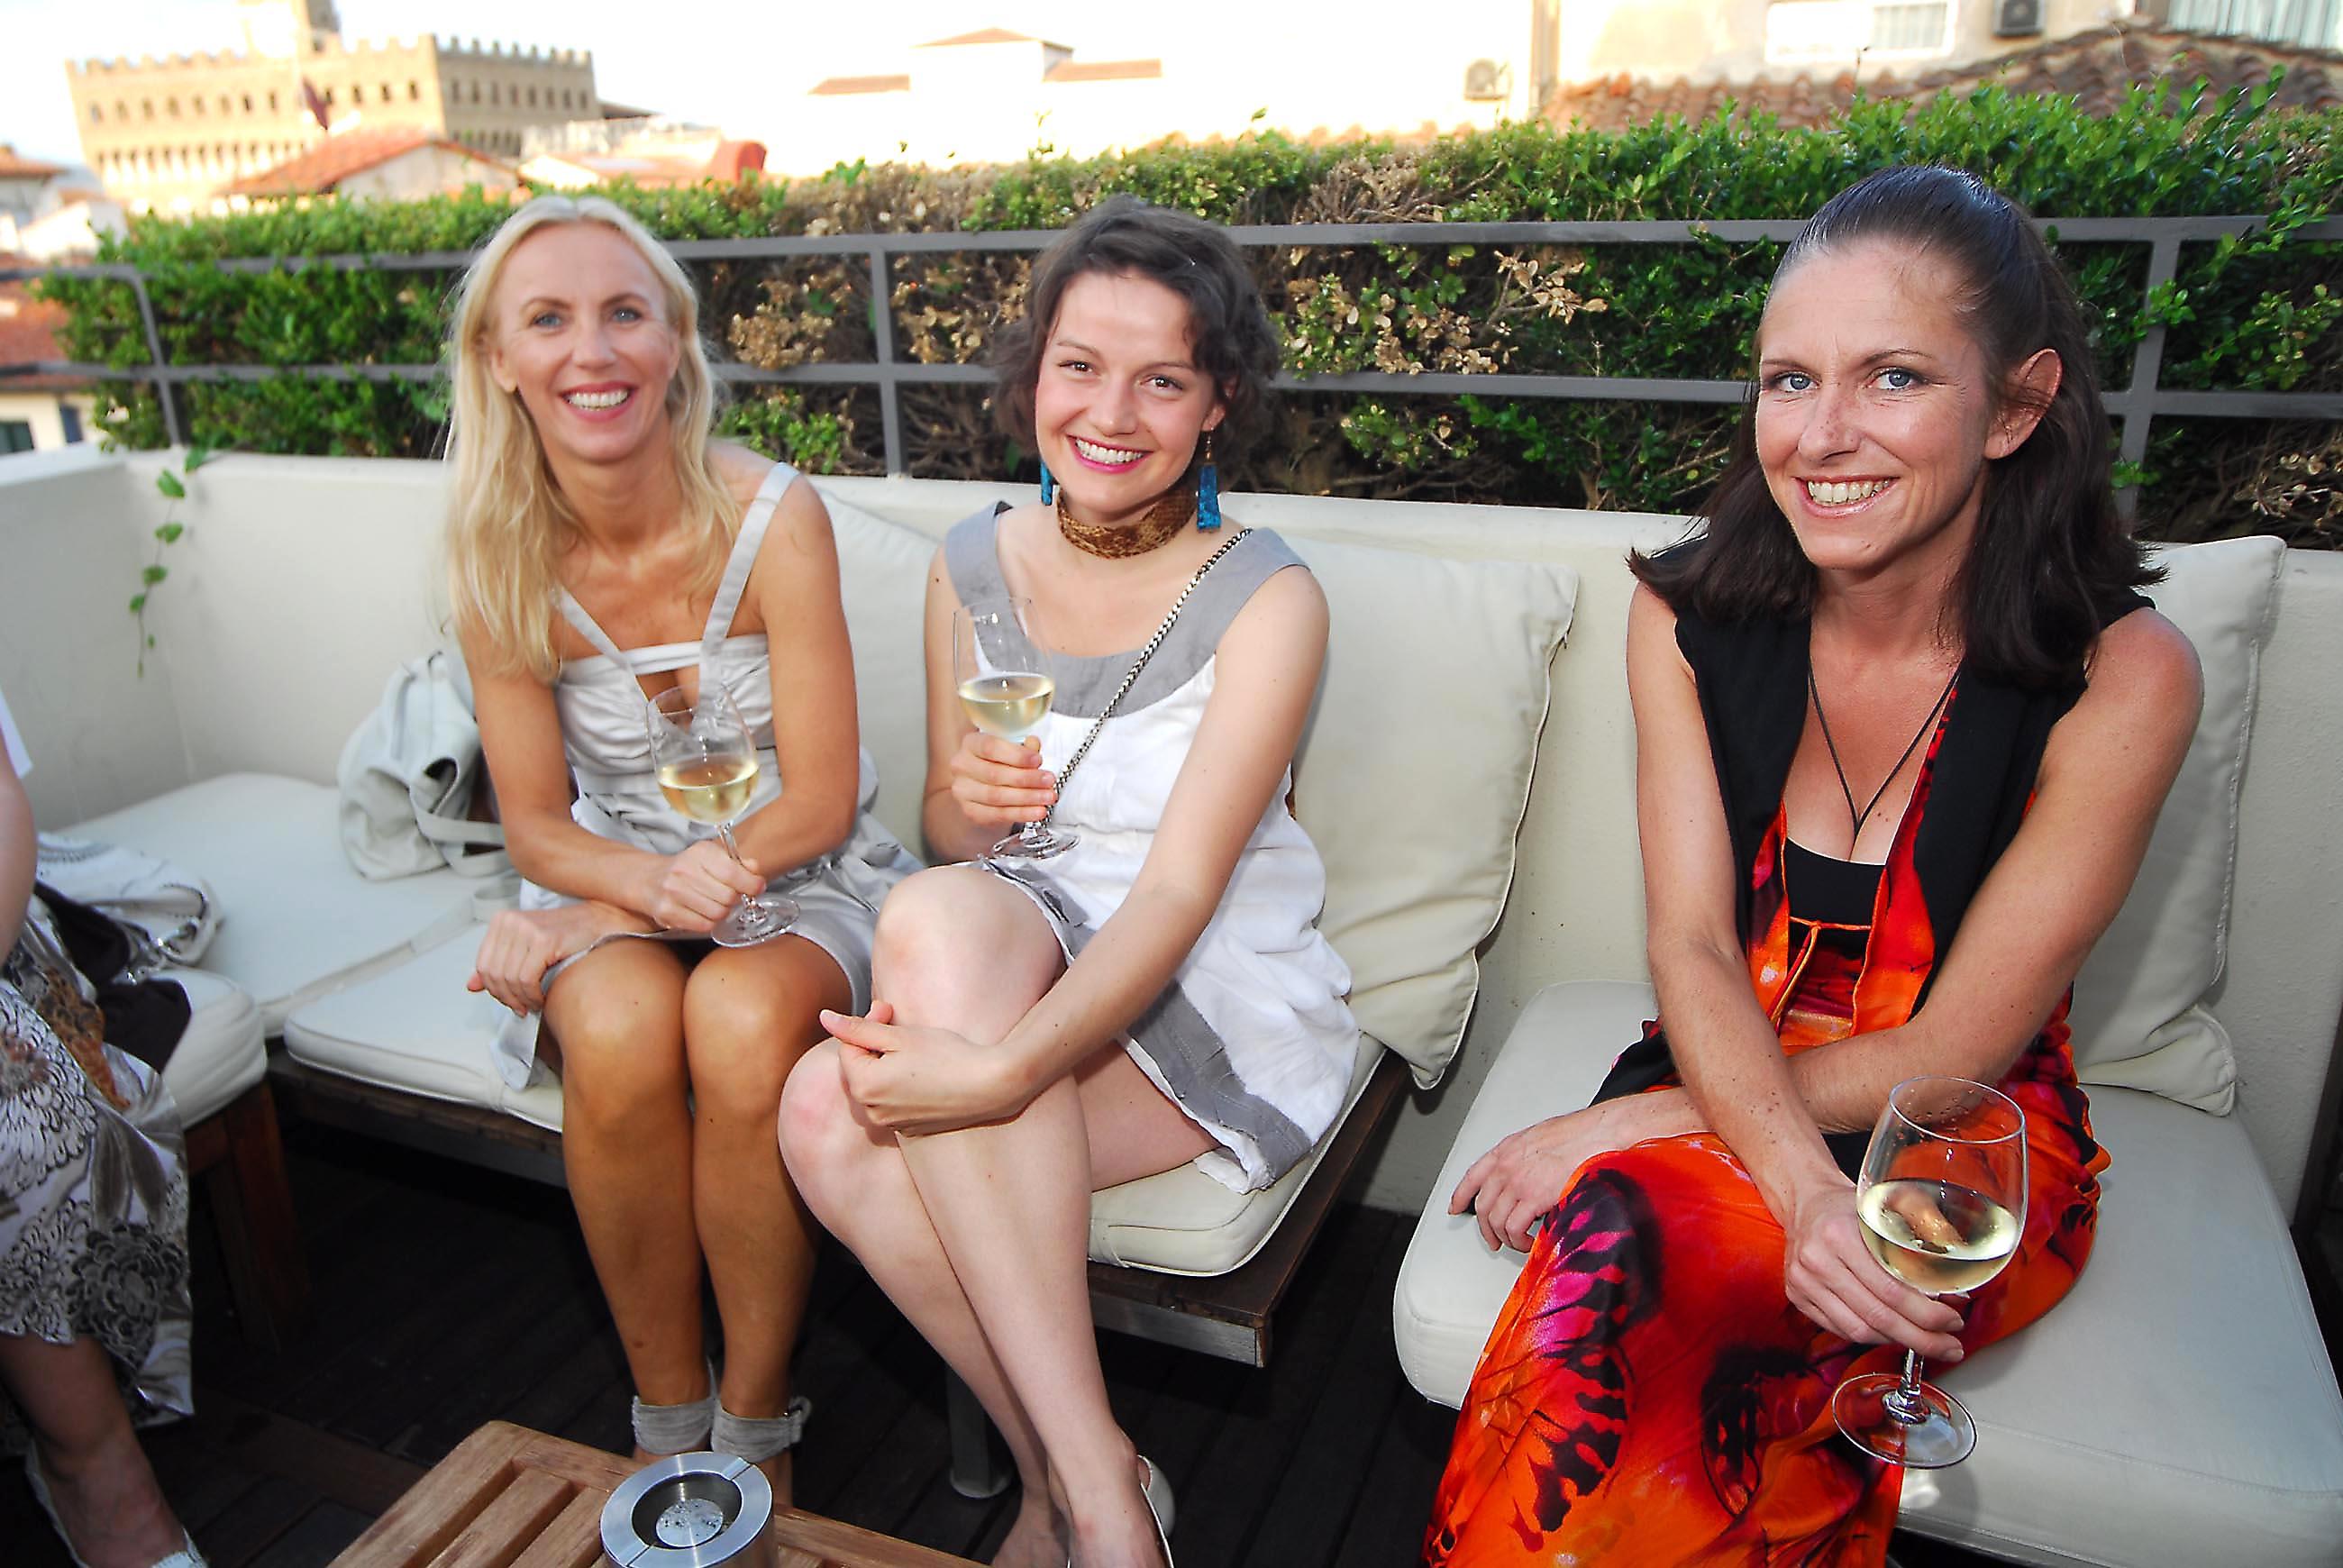 PRESSPHOTO  Firenze, Hotel Continentale. Nella foto Anja Rieger, Brigitte Ried e Edith Wollek